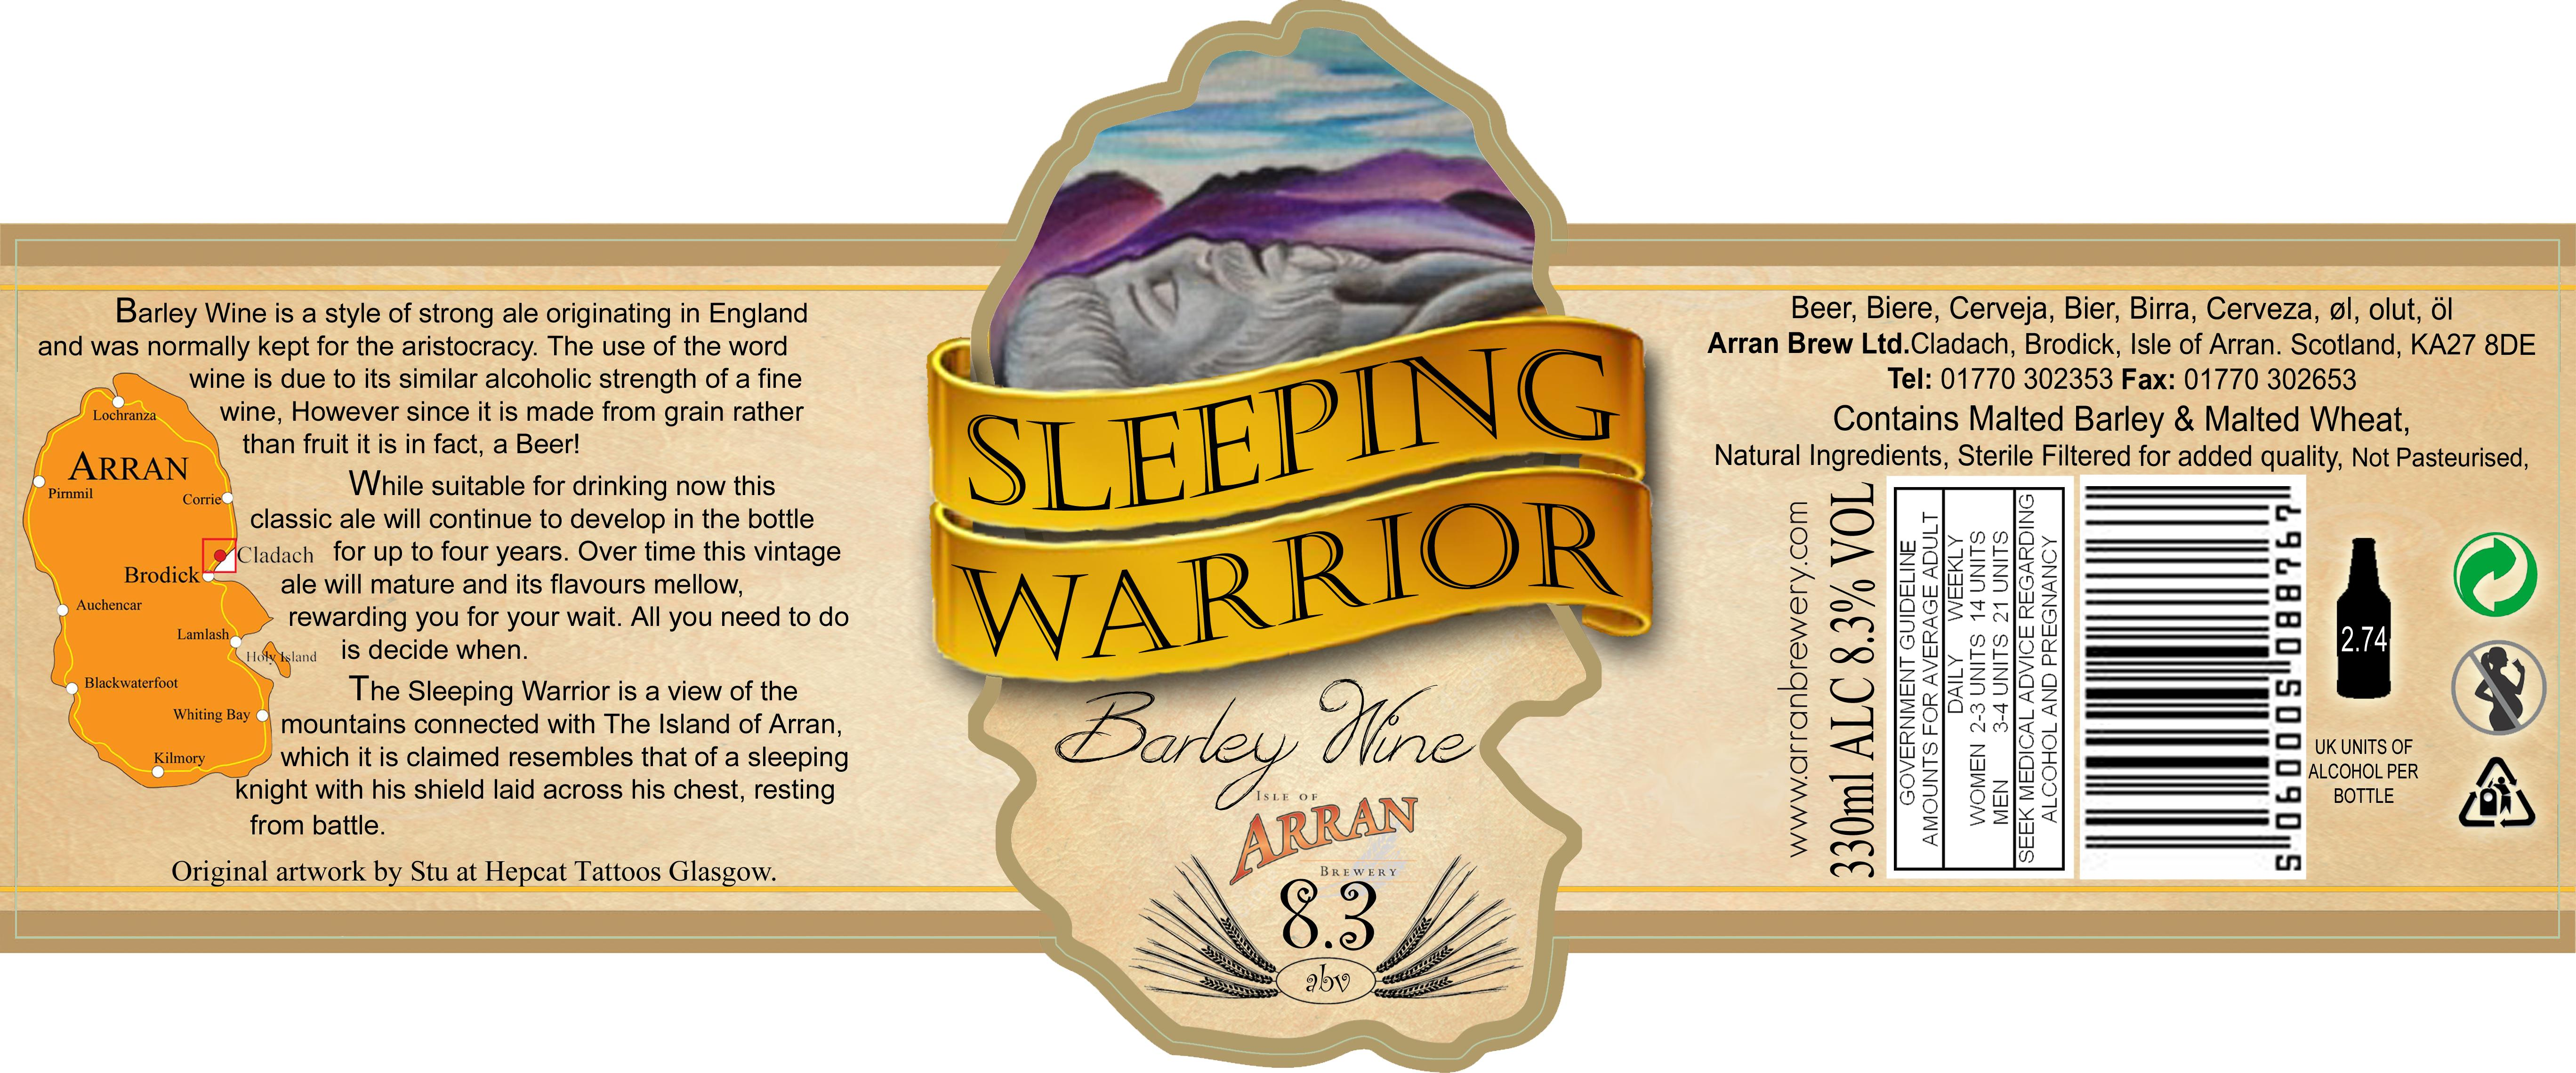 Sleeping_Warrior_Tattoo_Arran_Shaped_Wraparound_0.6.8(18x7.5cm_300dpi)